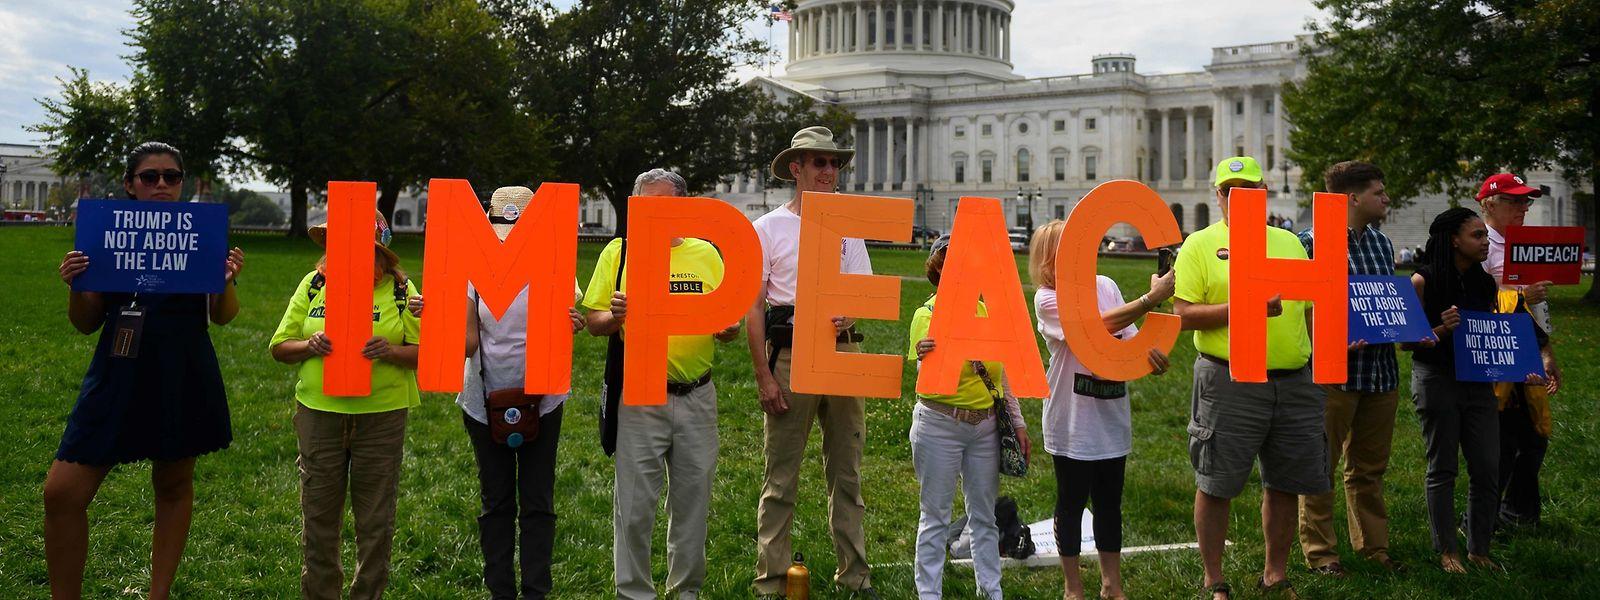 Demonstranten vor dem Kapitol in Washington DC.